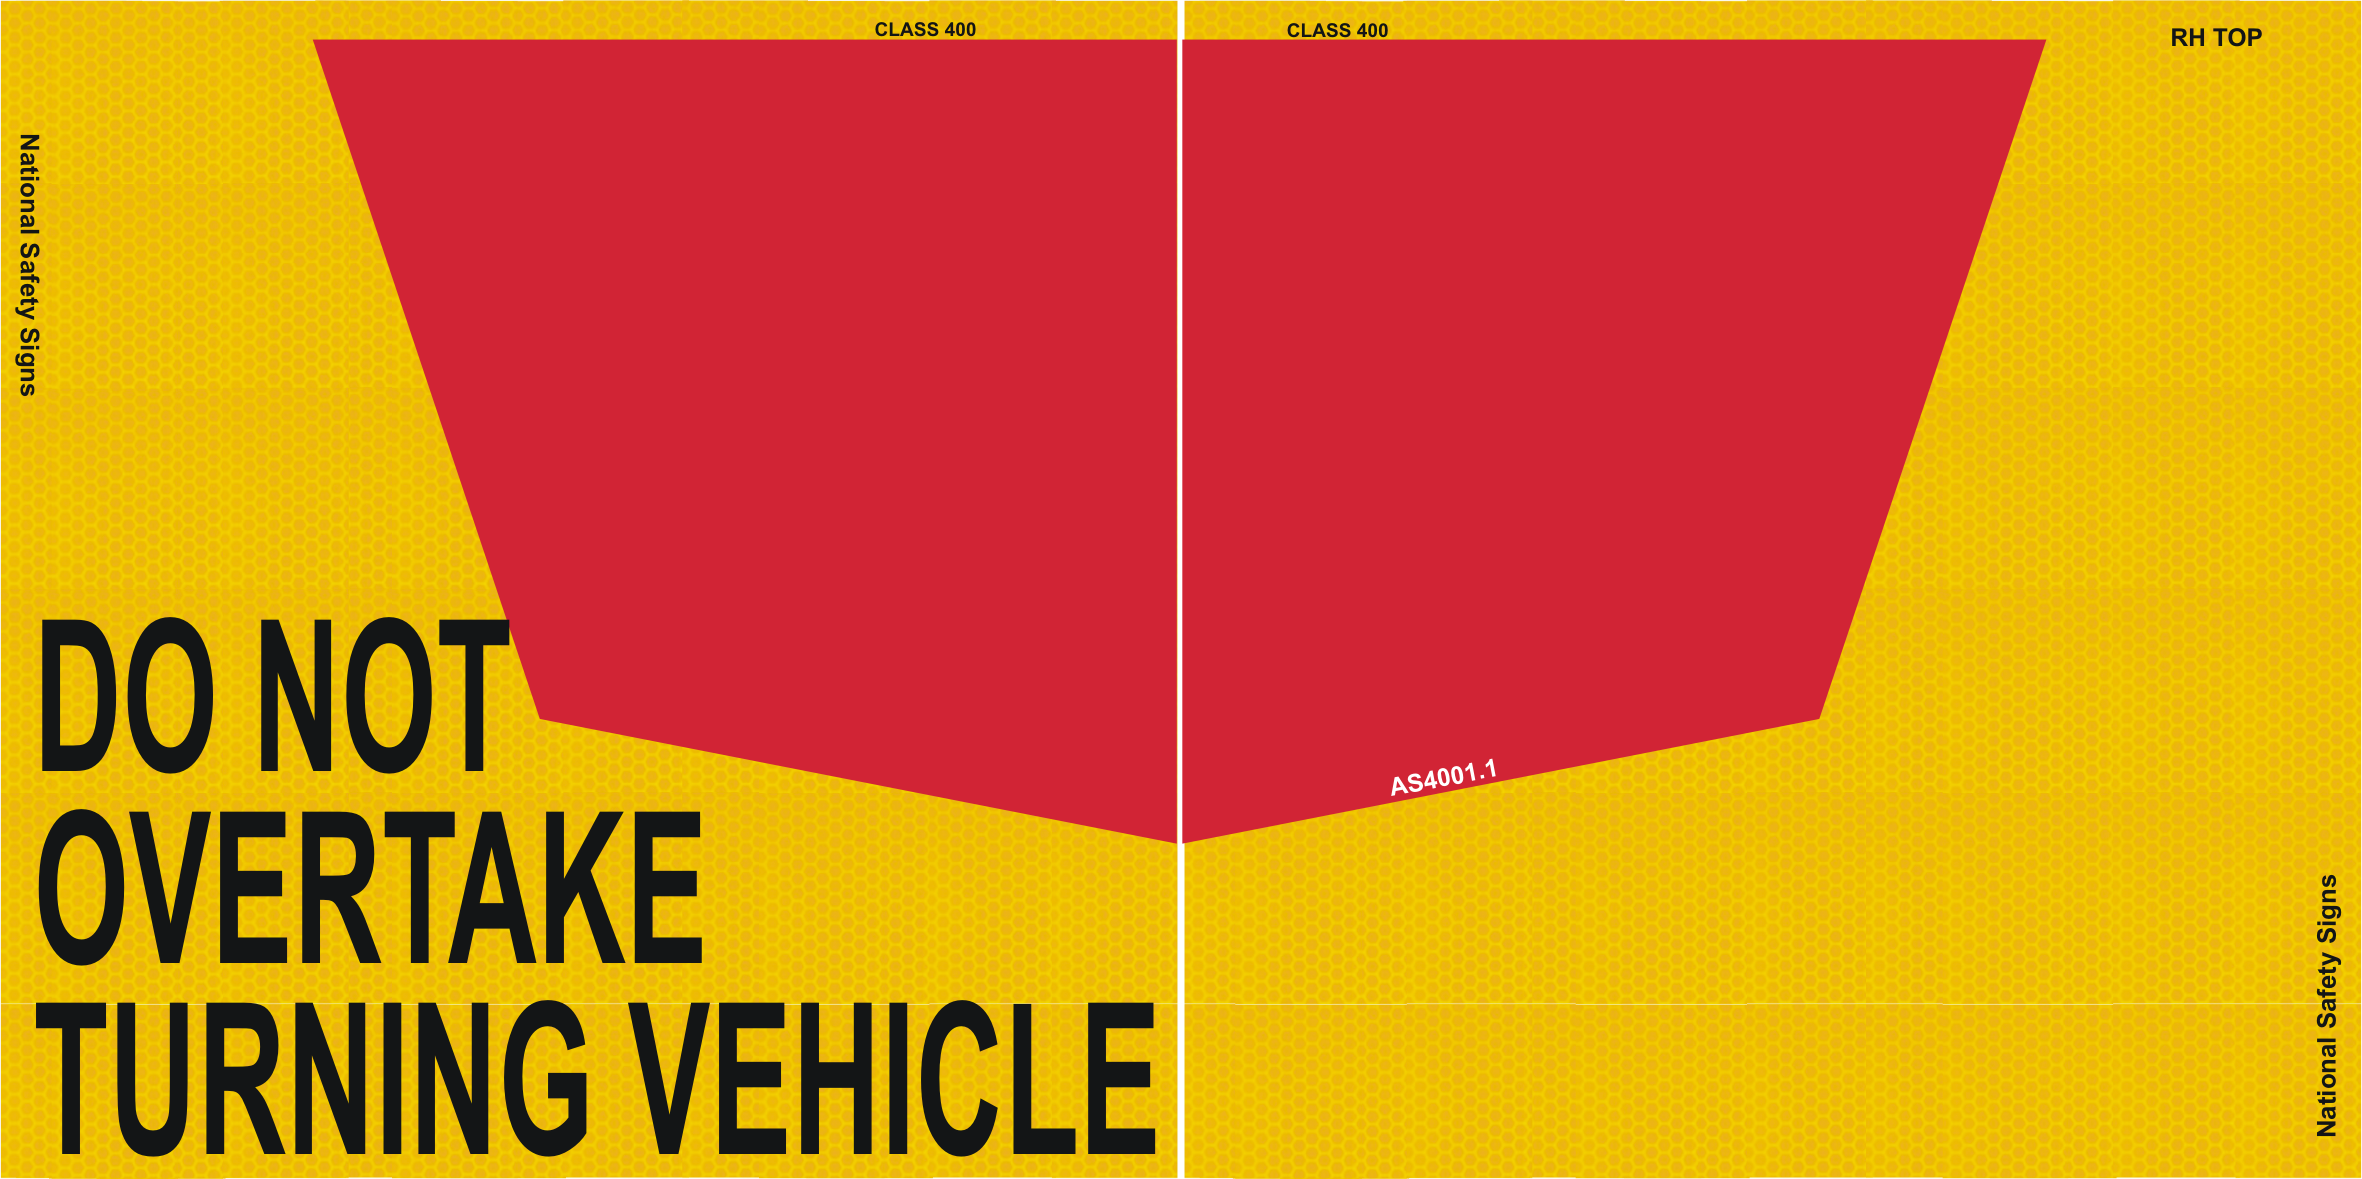 NSW do not overtake turning vehicle sign